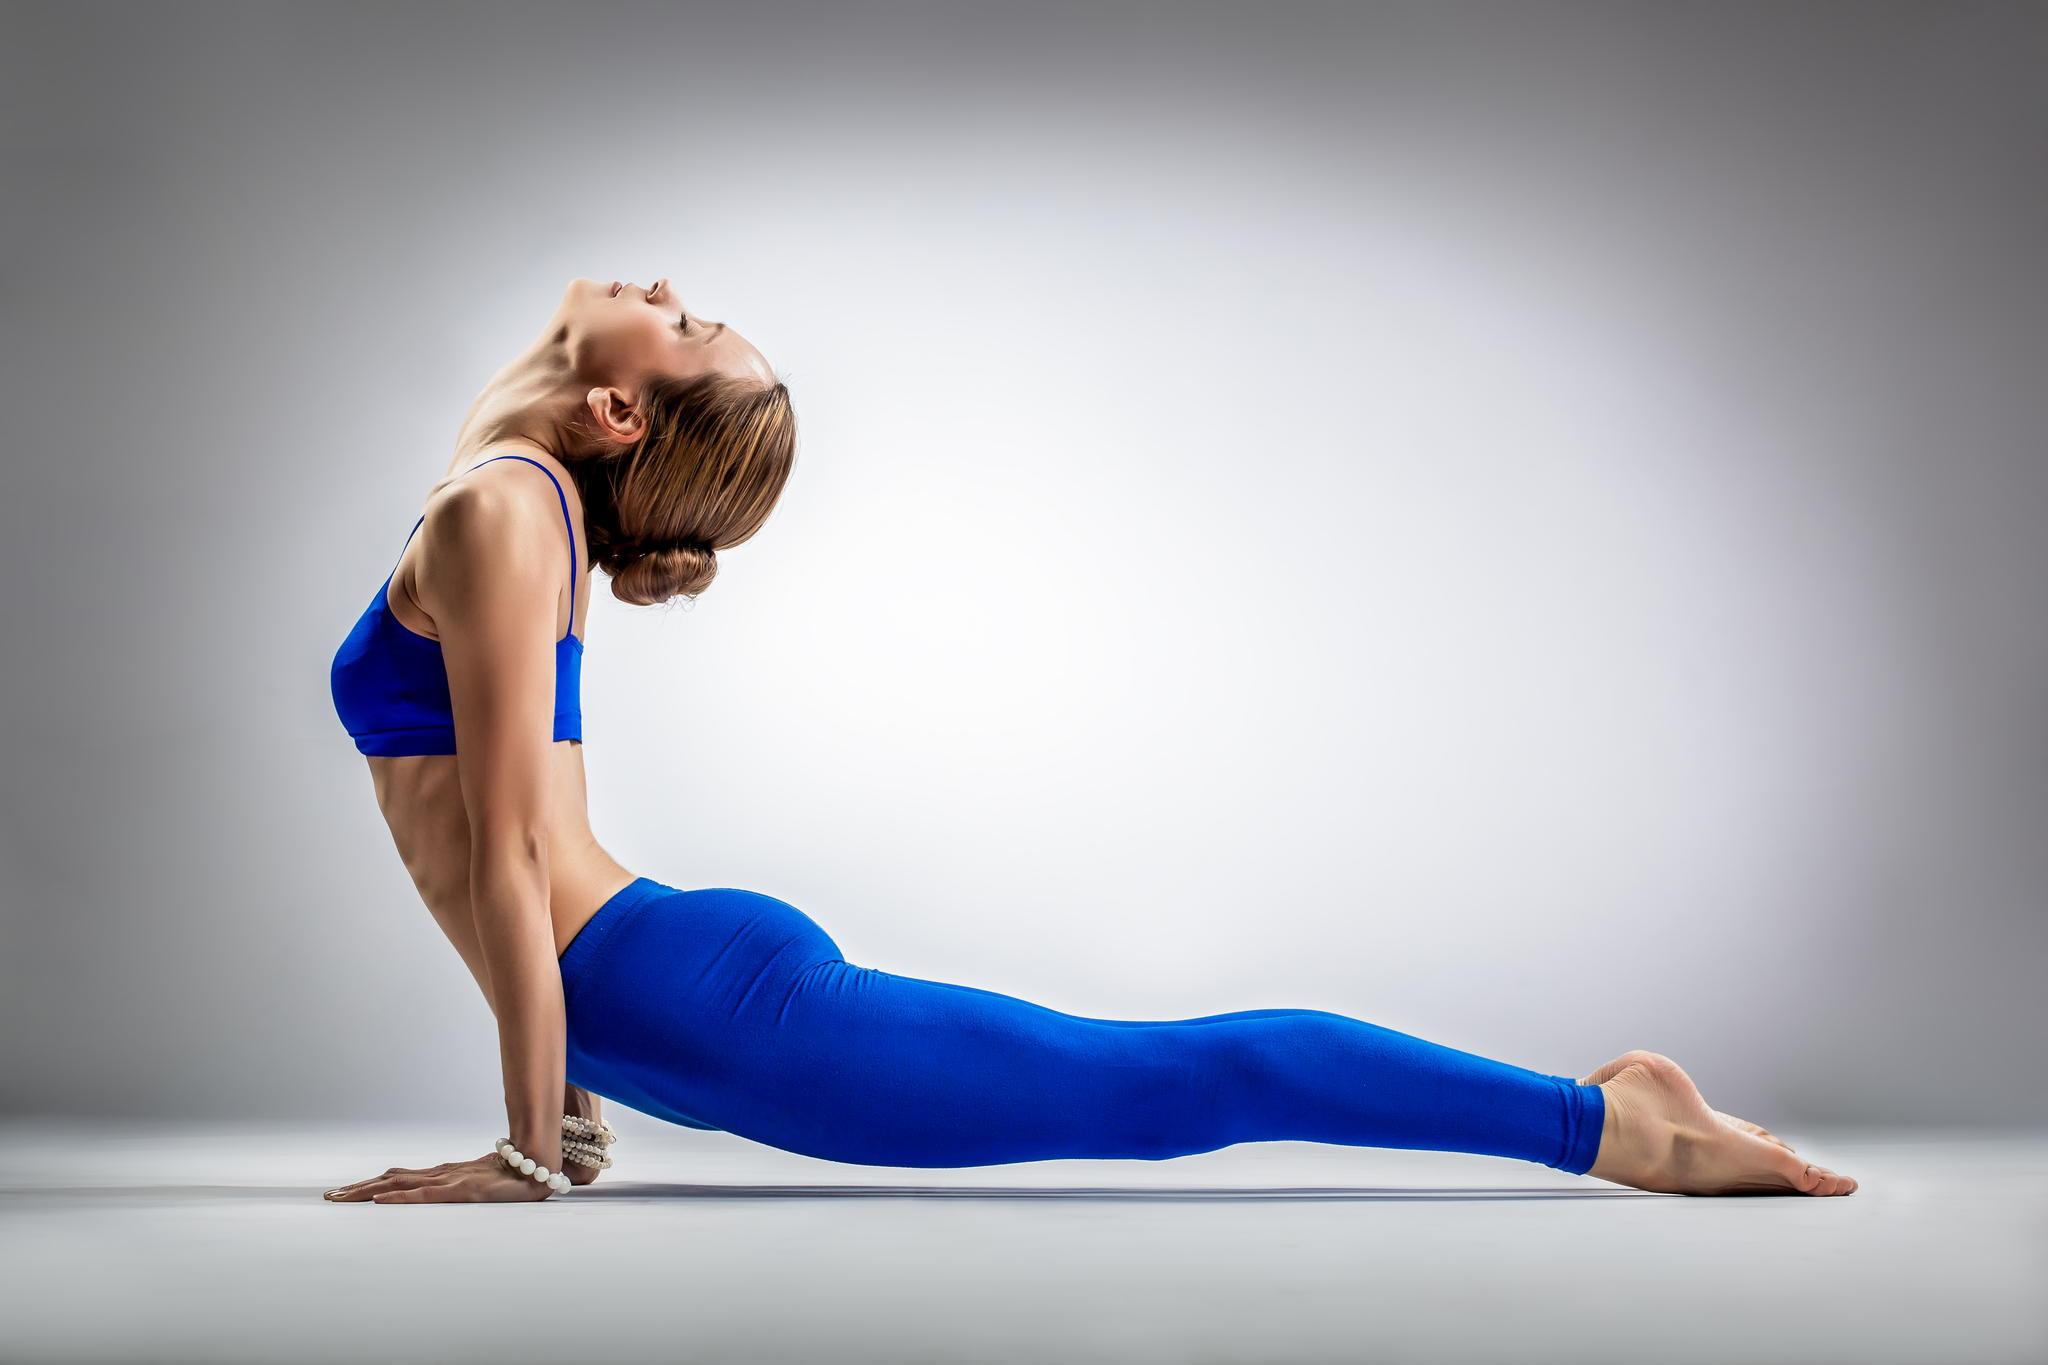 the yoga woman – young beautiful yoga posing on a gray studio background